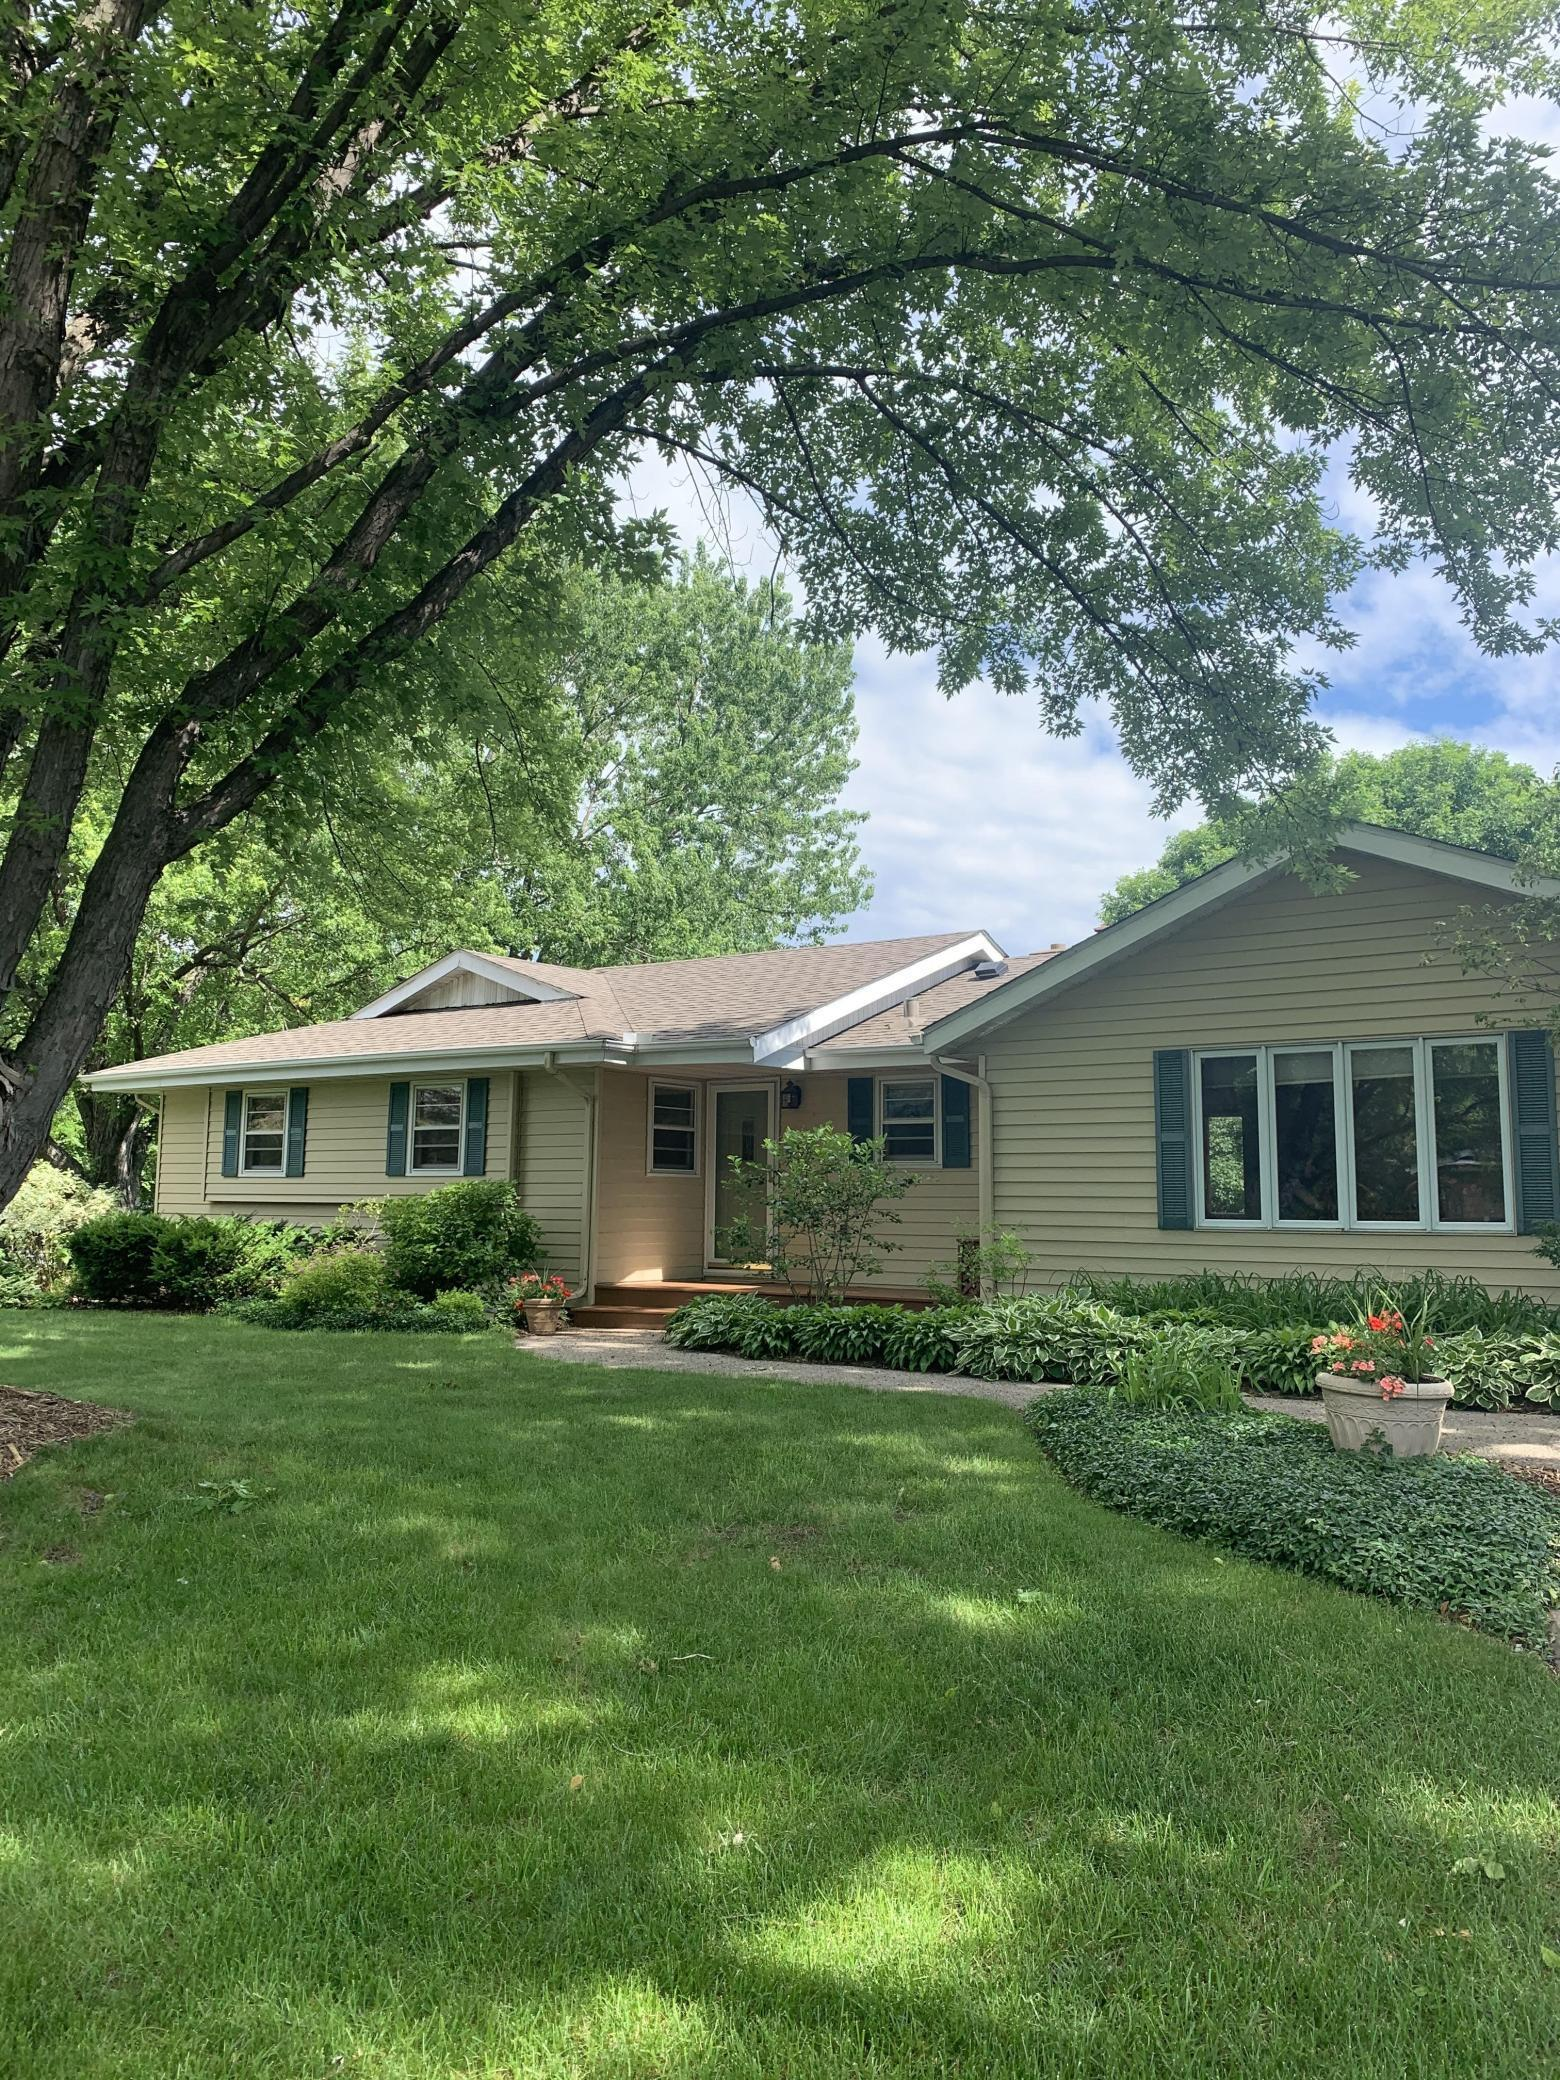 772 Keokuk Property Photo - Mendota Heights, MN real estate listing